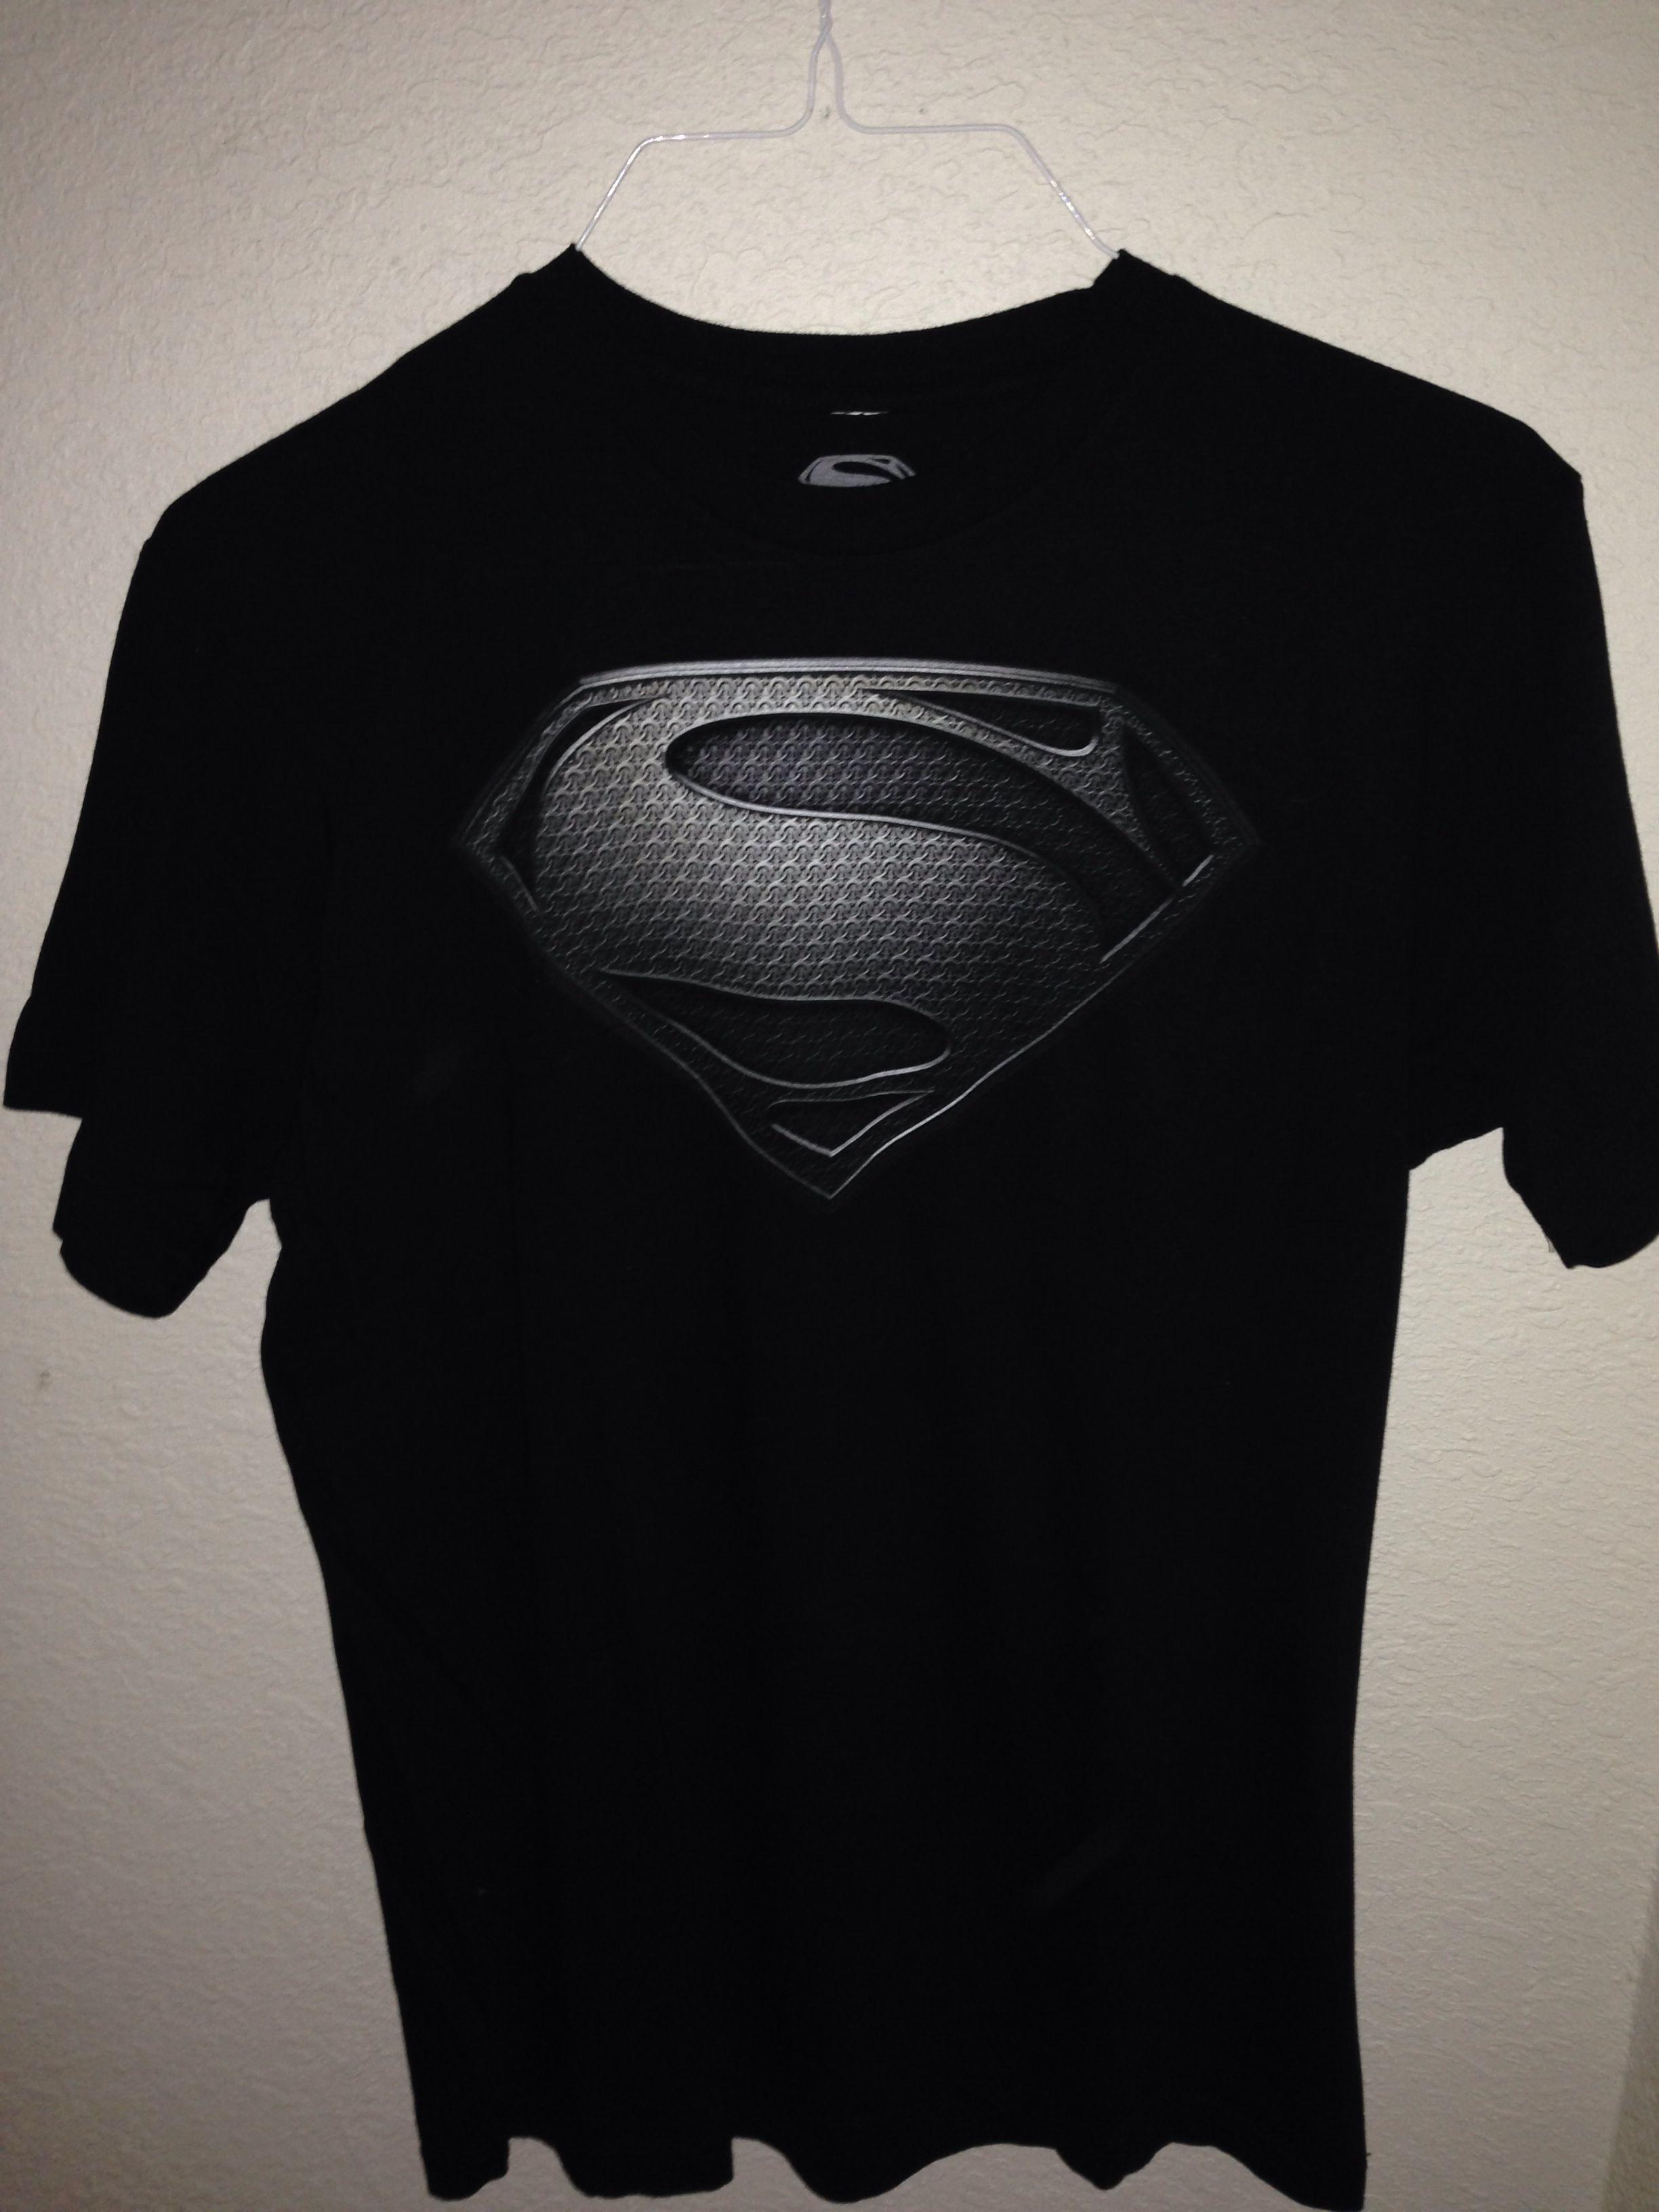 439735ca Superman Tshirt- Man of Steel